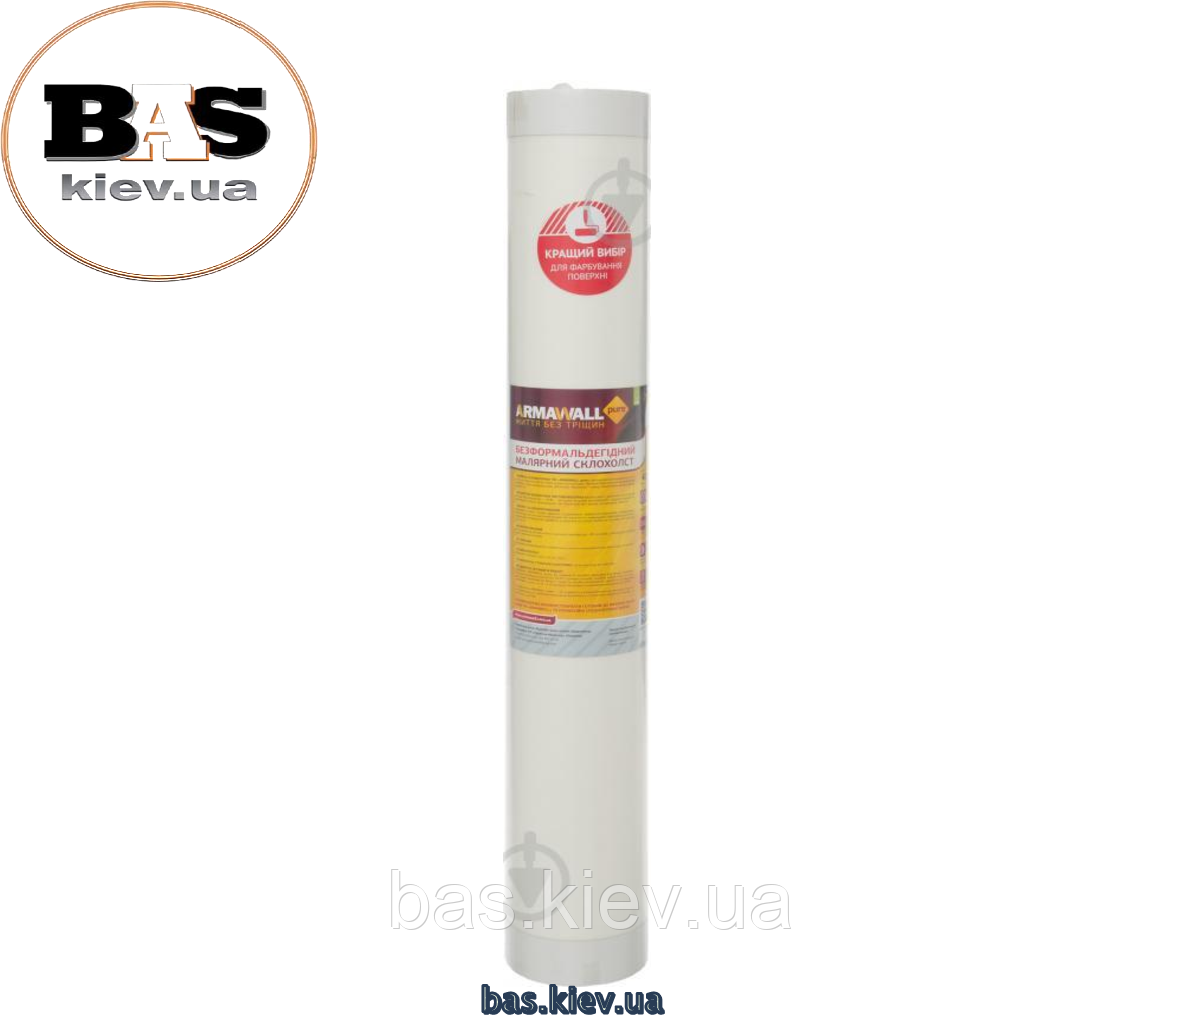 Малярный стеклохолст pure ArmaWall , 45 плотности, 50 м2